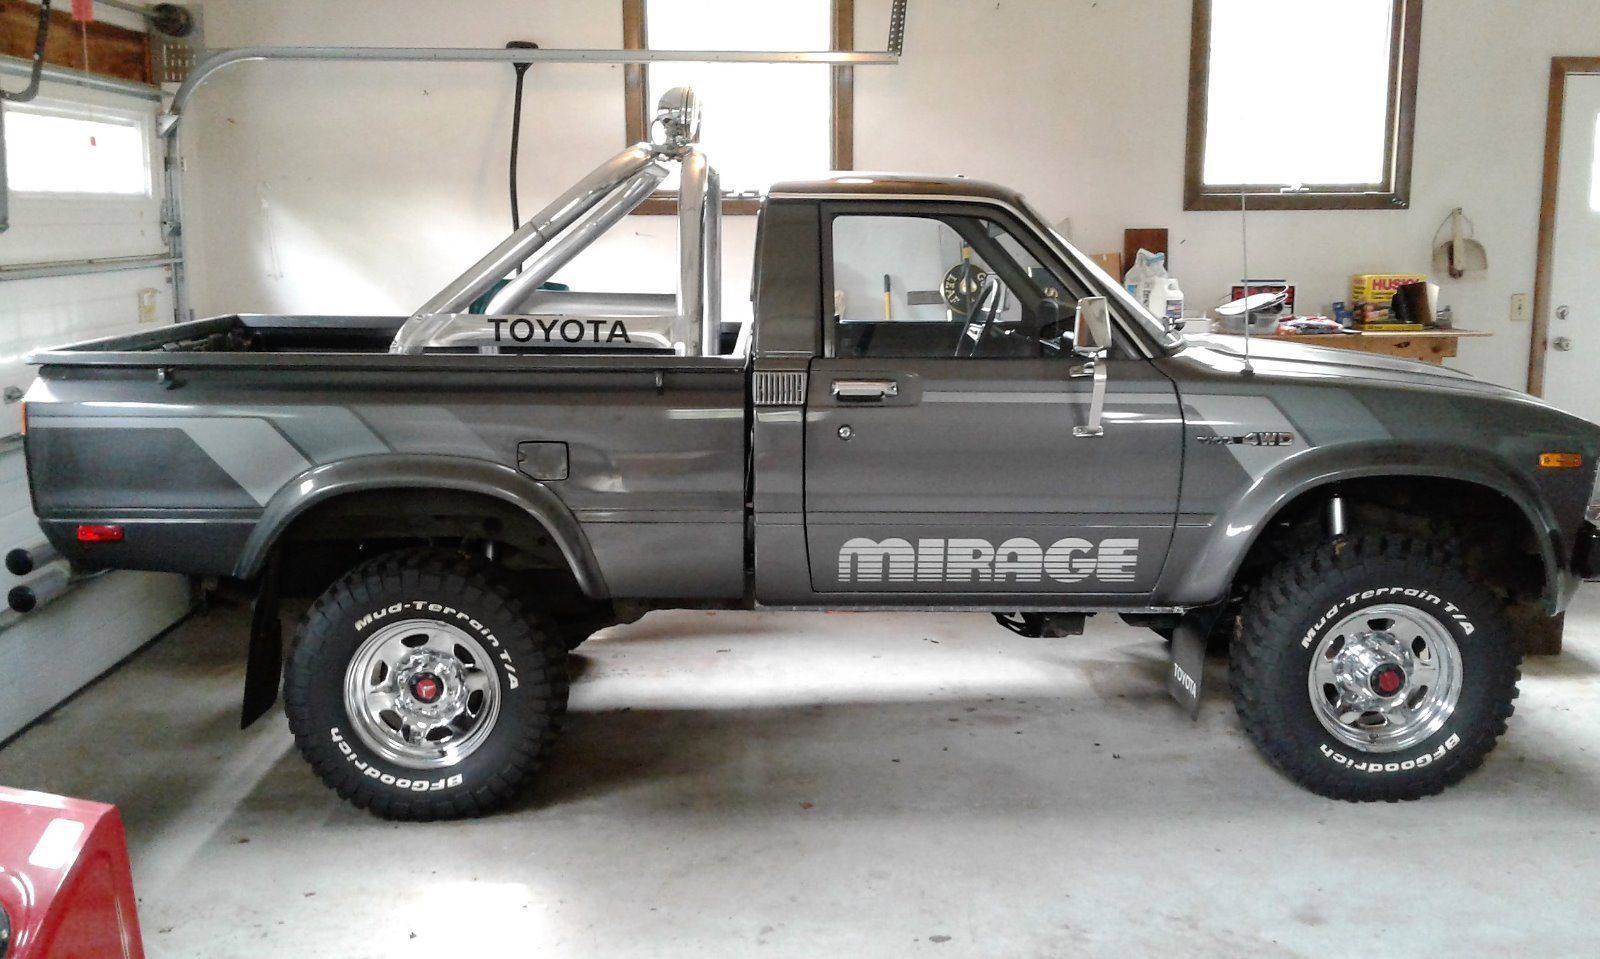 medium resolution of 1983 toyota sr 5 4x4 pickup truck mirage limited edition 1983 toyota hilux 4x4 pickup truck mirage edition the toyota hilux tr